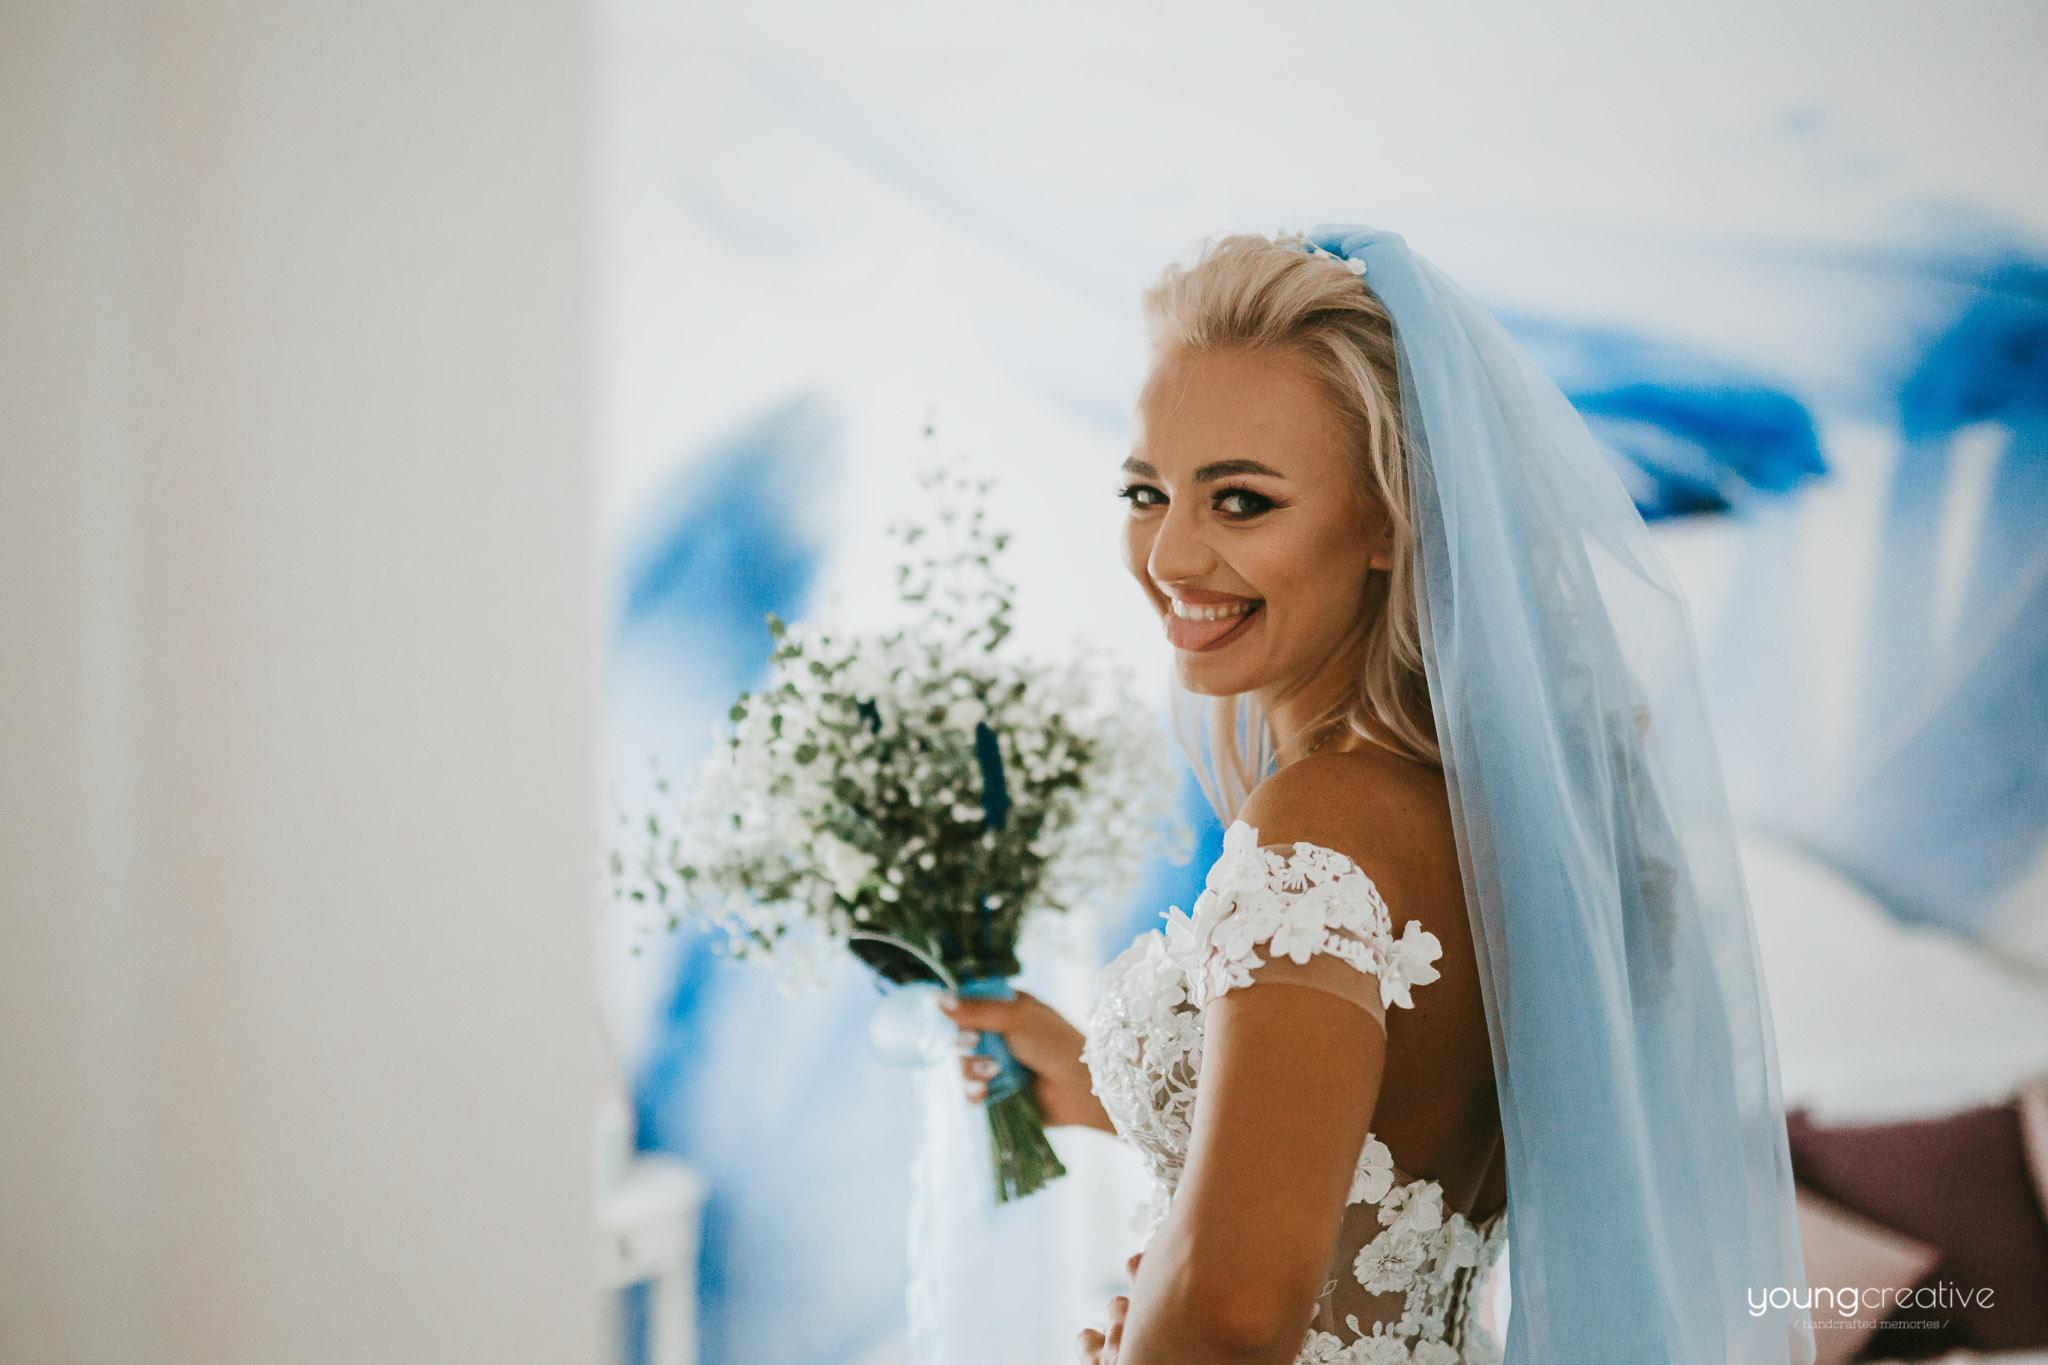 Petrina & Ionut | youngcreative.info media © Dan Filipciuc, Cristina Bejan | fotograf nunta Iasi